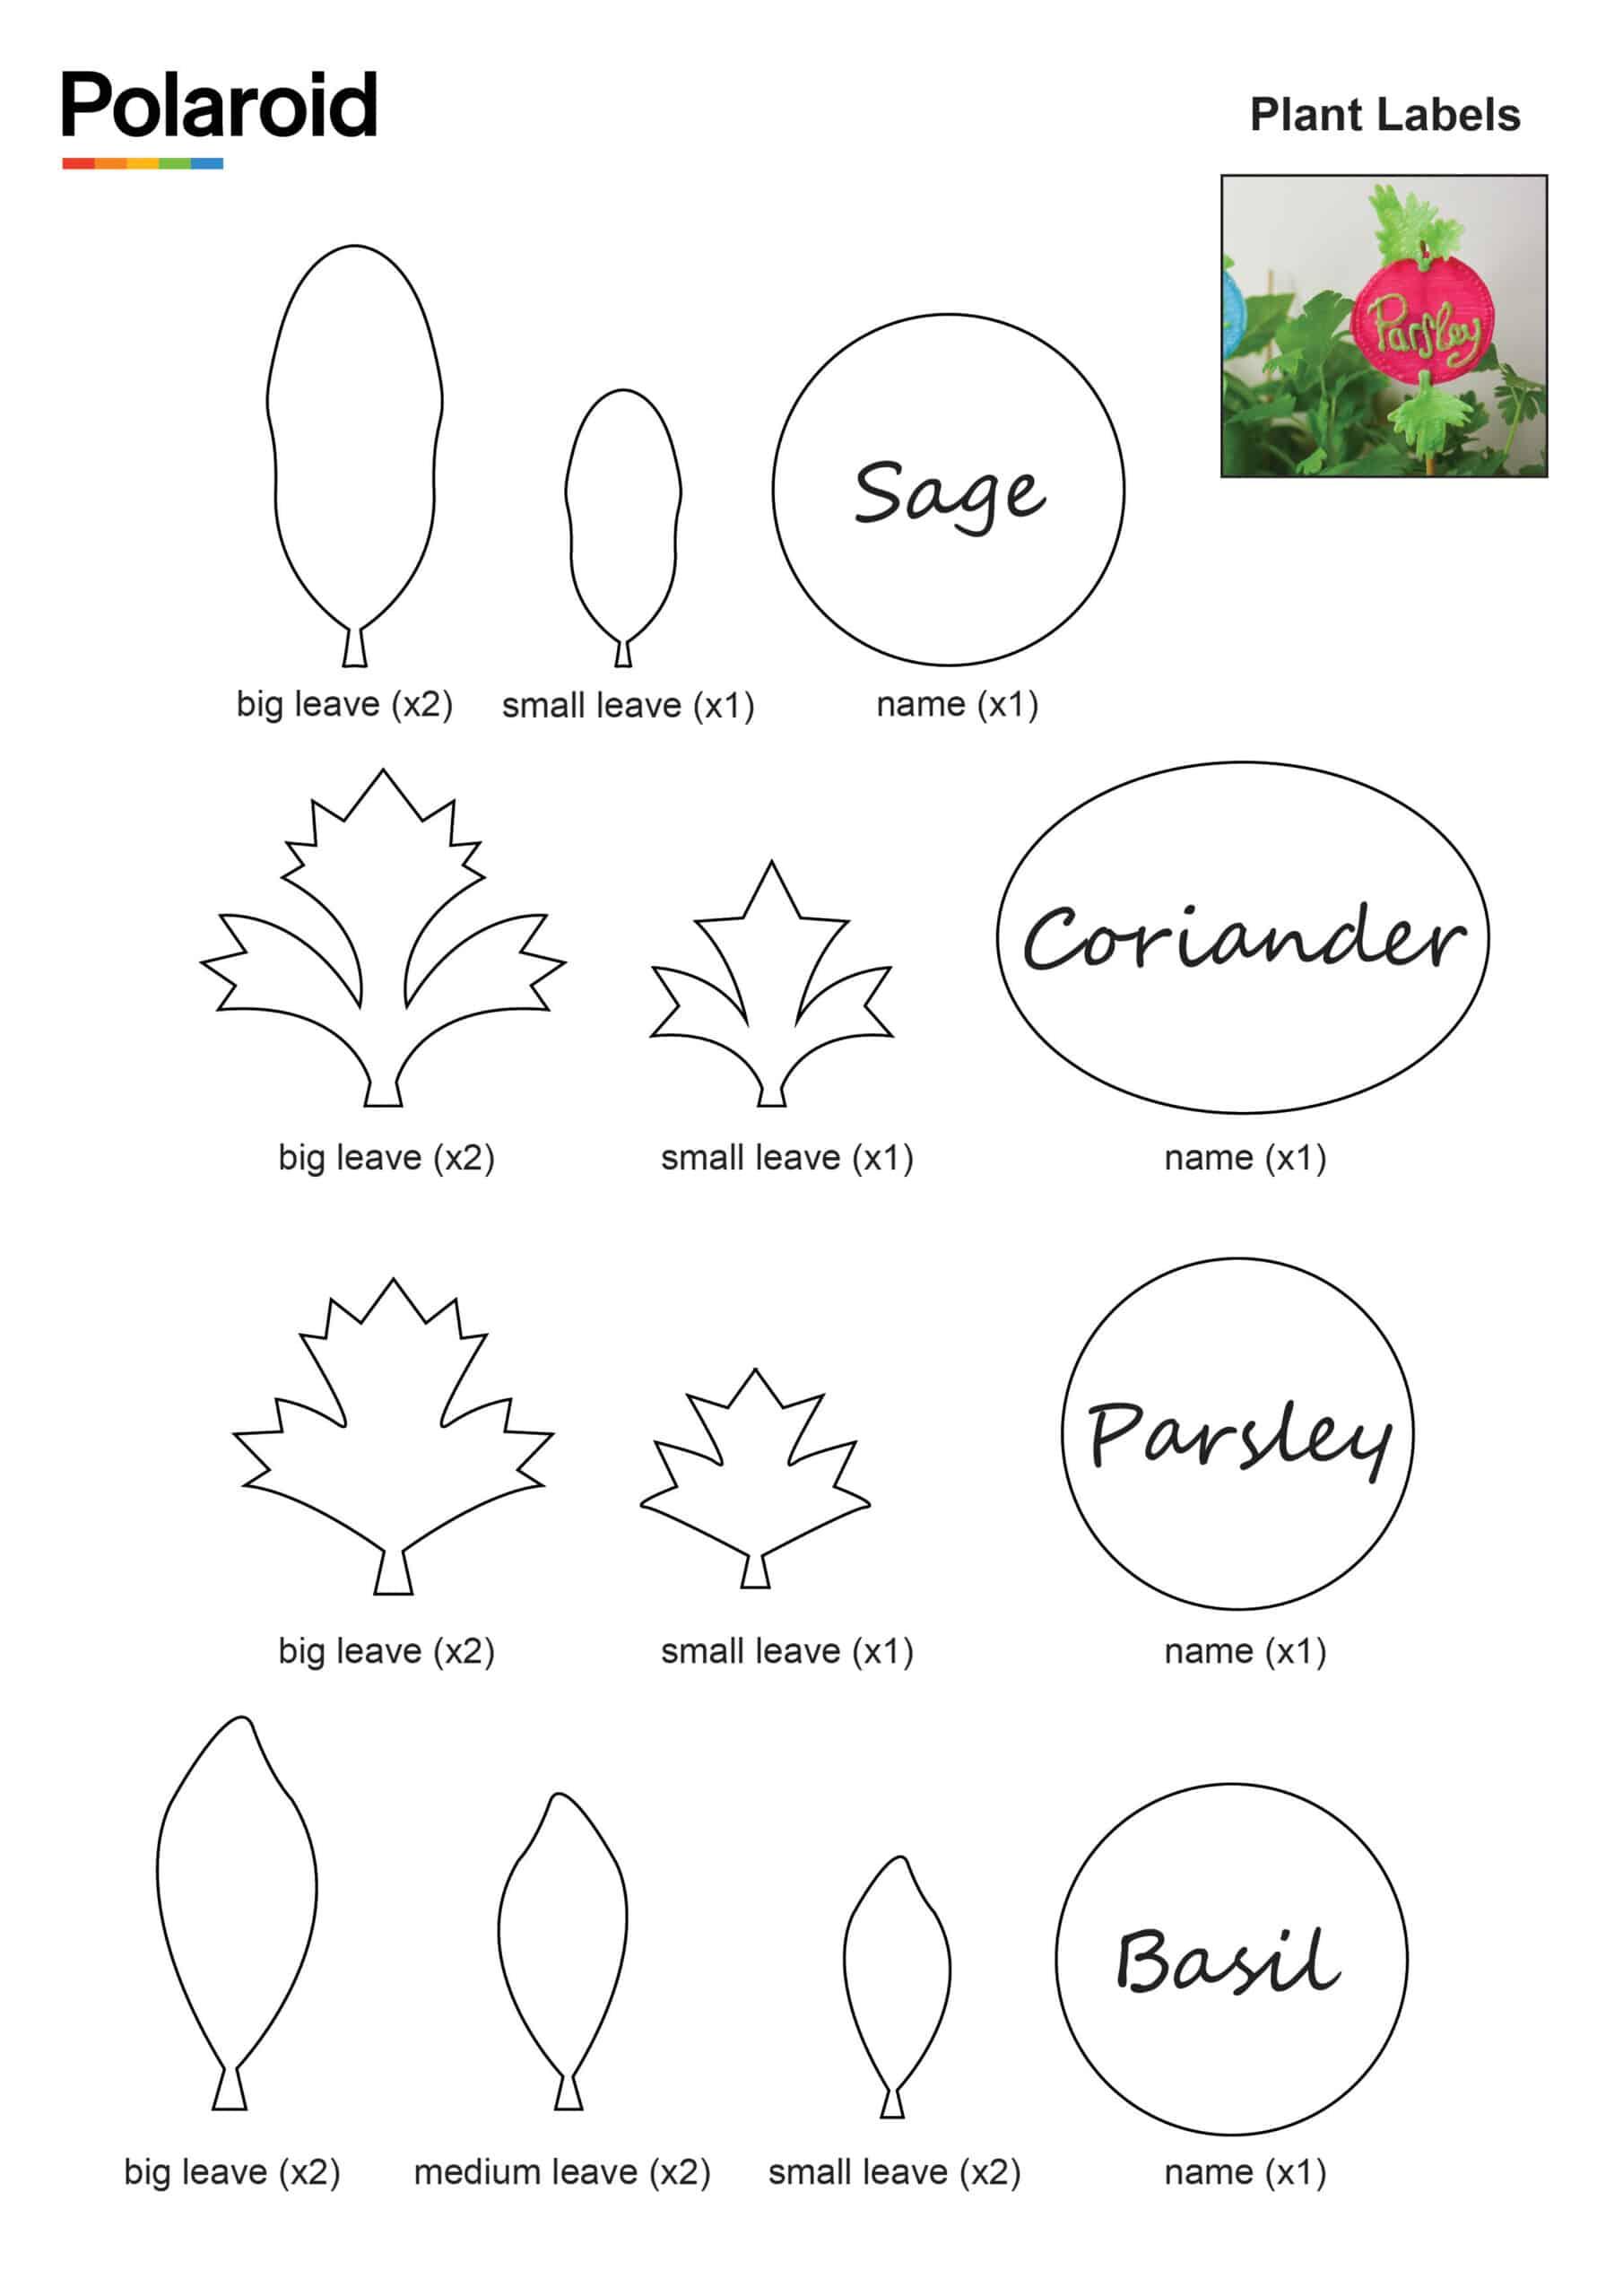 Plant Labels_New Logo